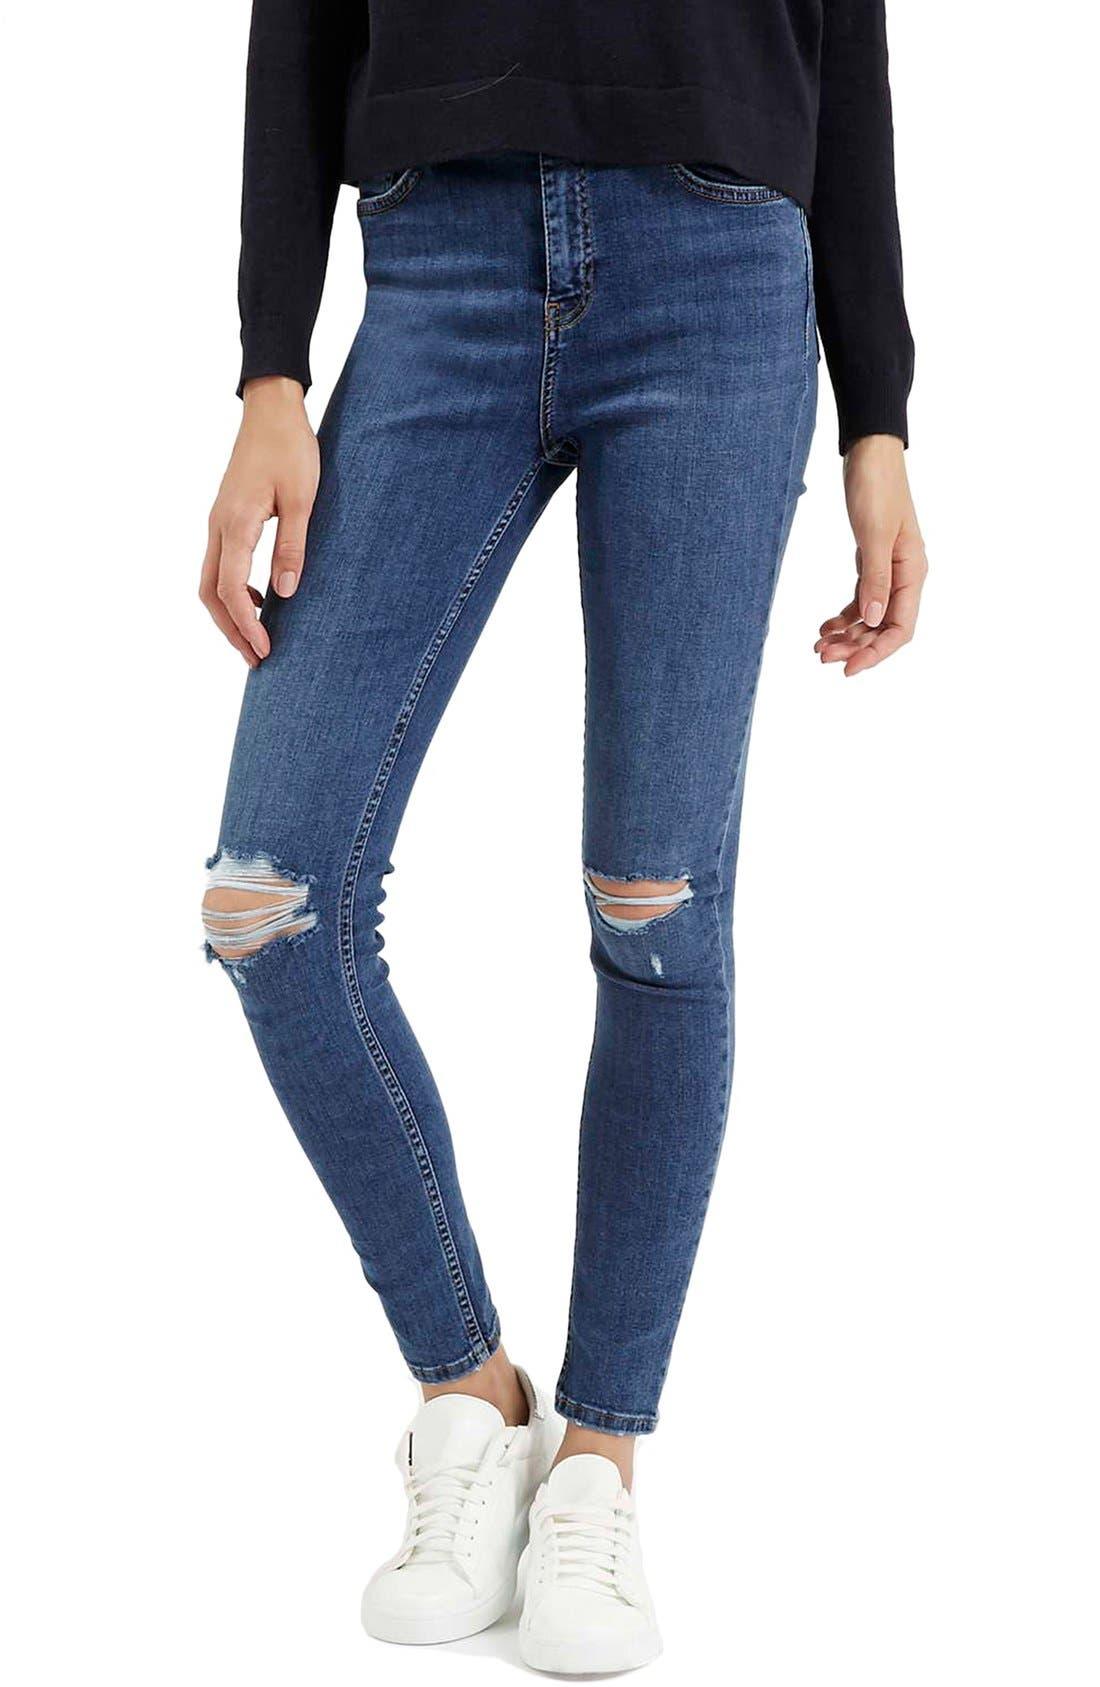 Alternate Image 1 Selected - Topshop Moto 'Jamie' Ripped Ankle Jeans (Mid Denim) (Regular & Short)